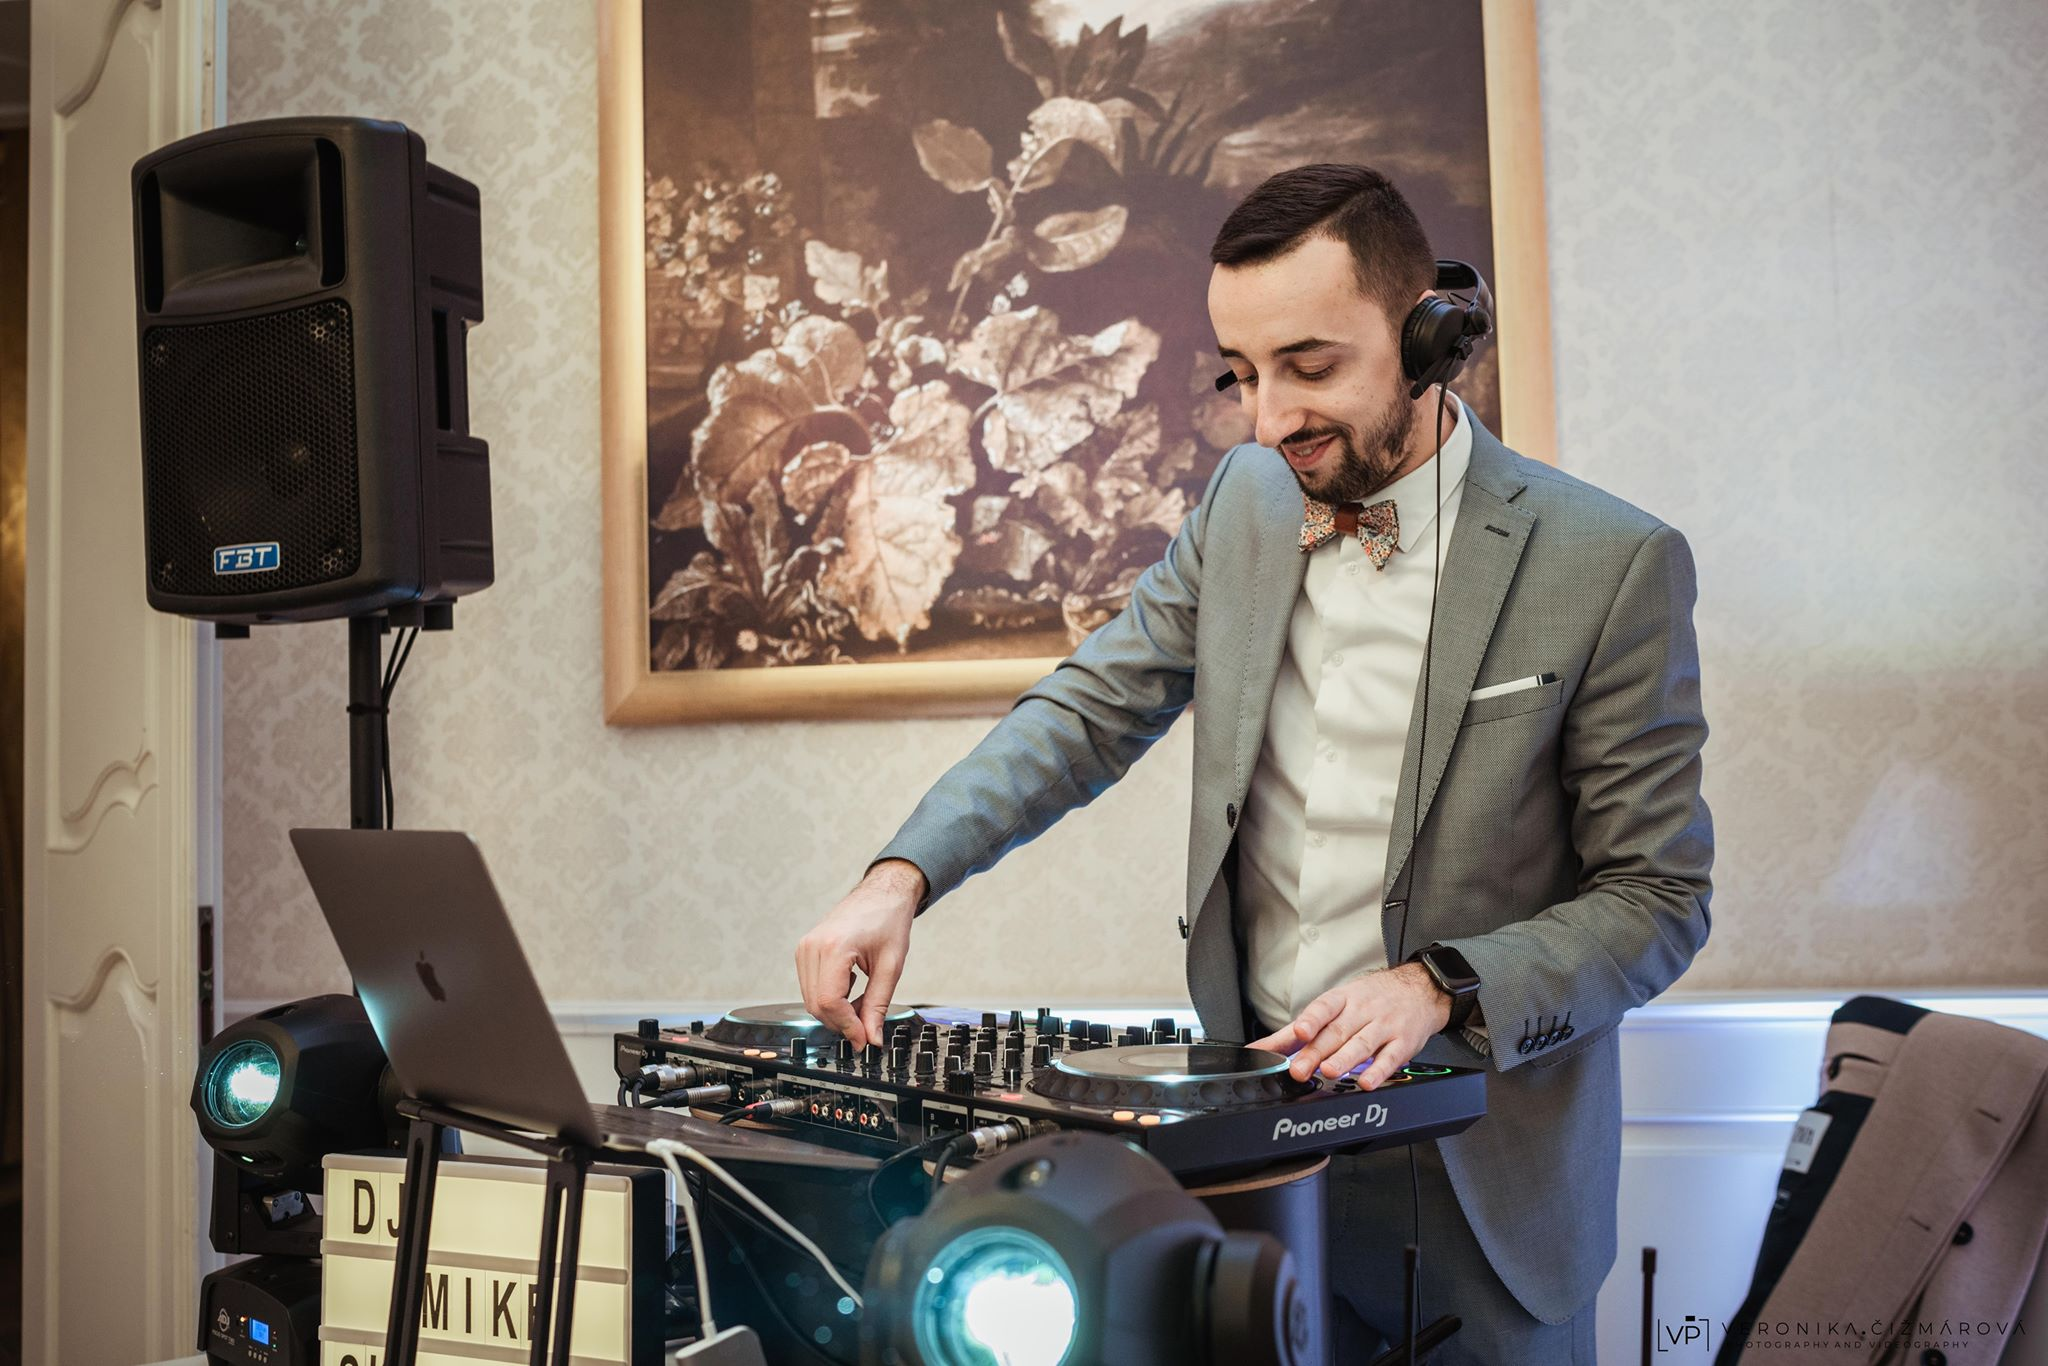 DJ-Mikejpg